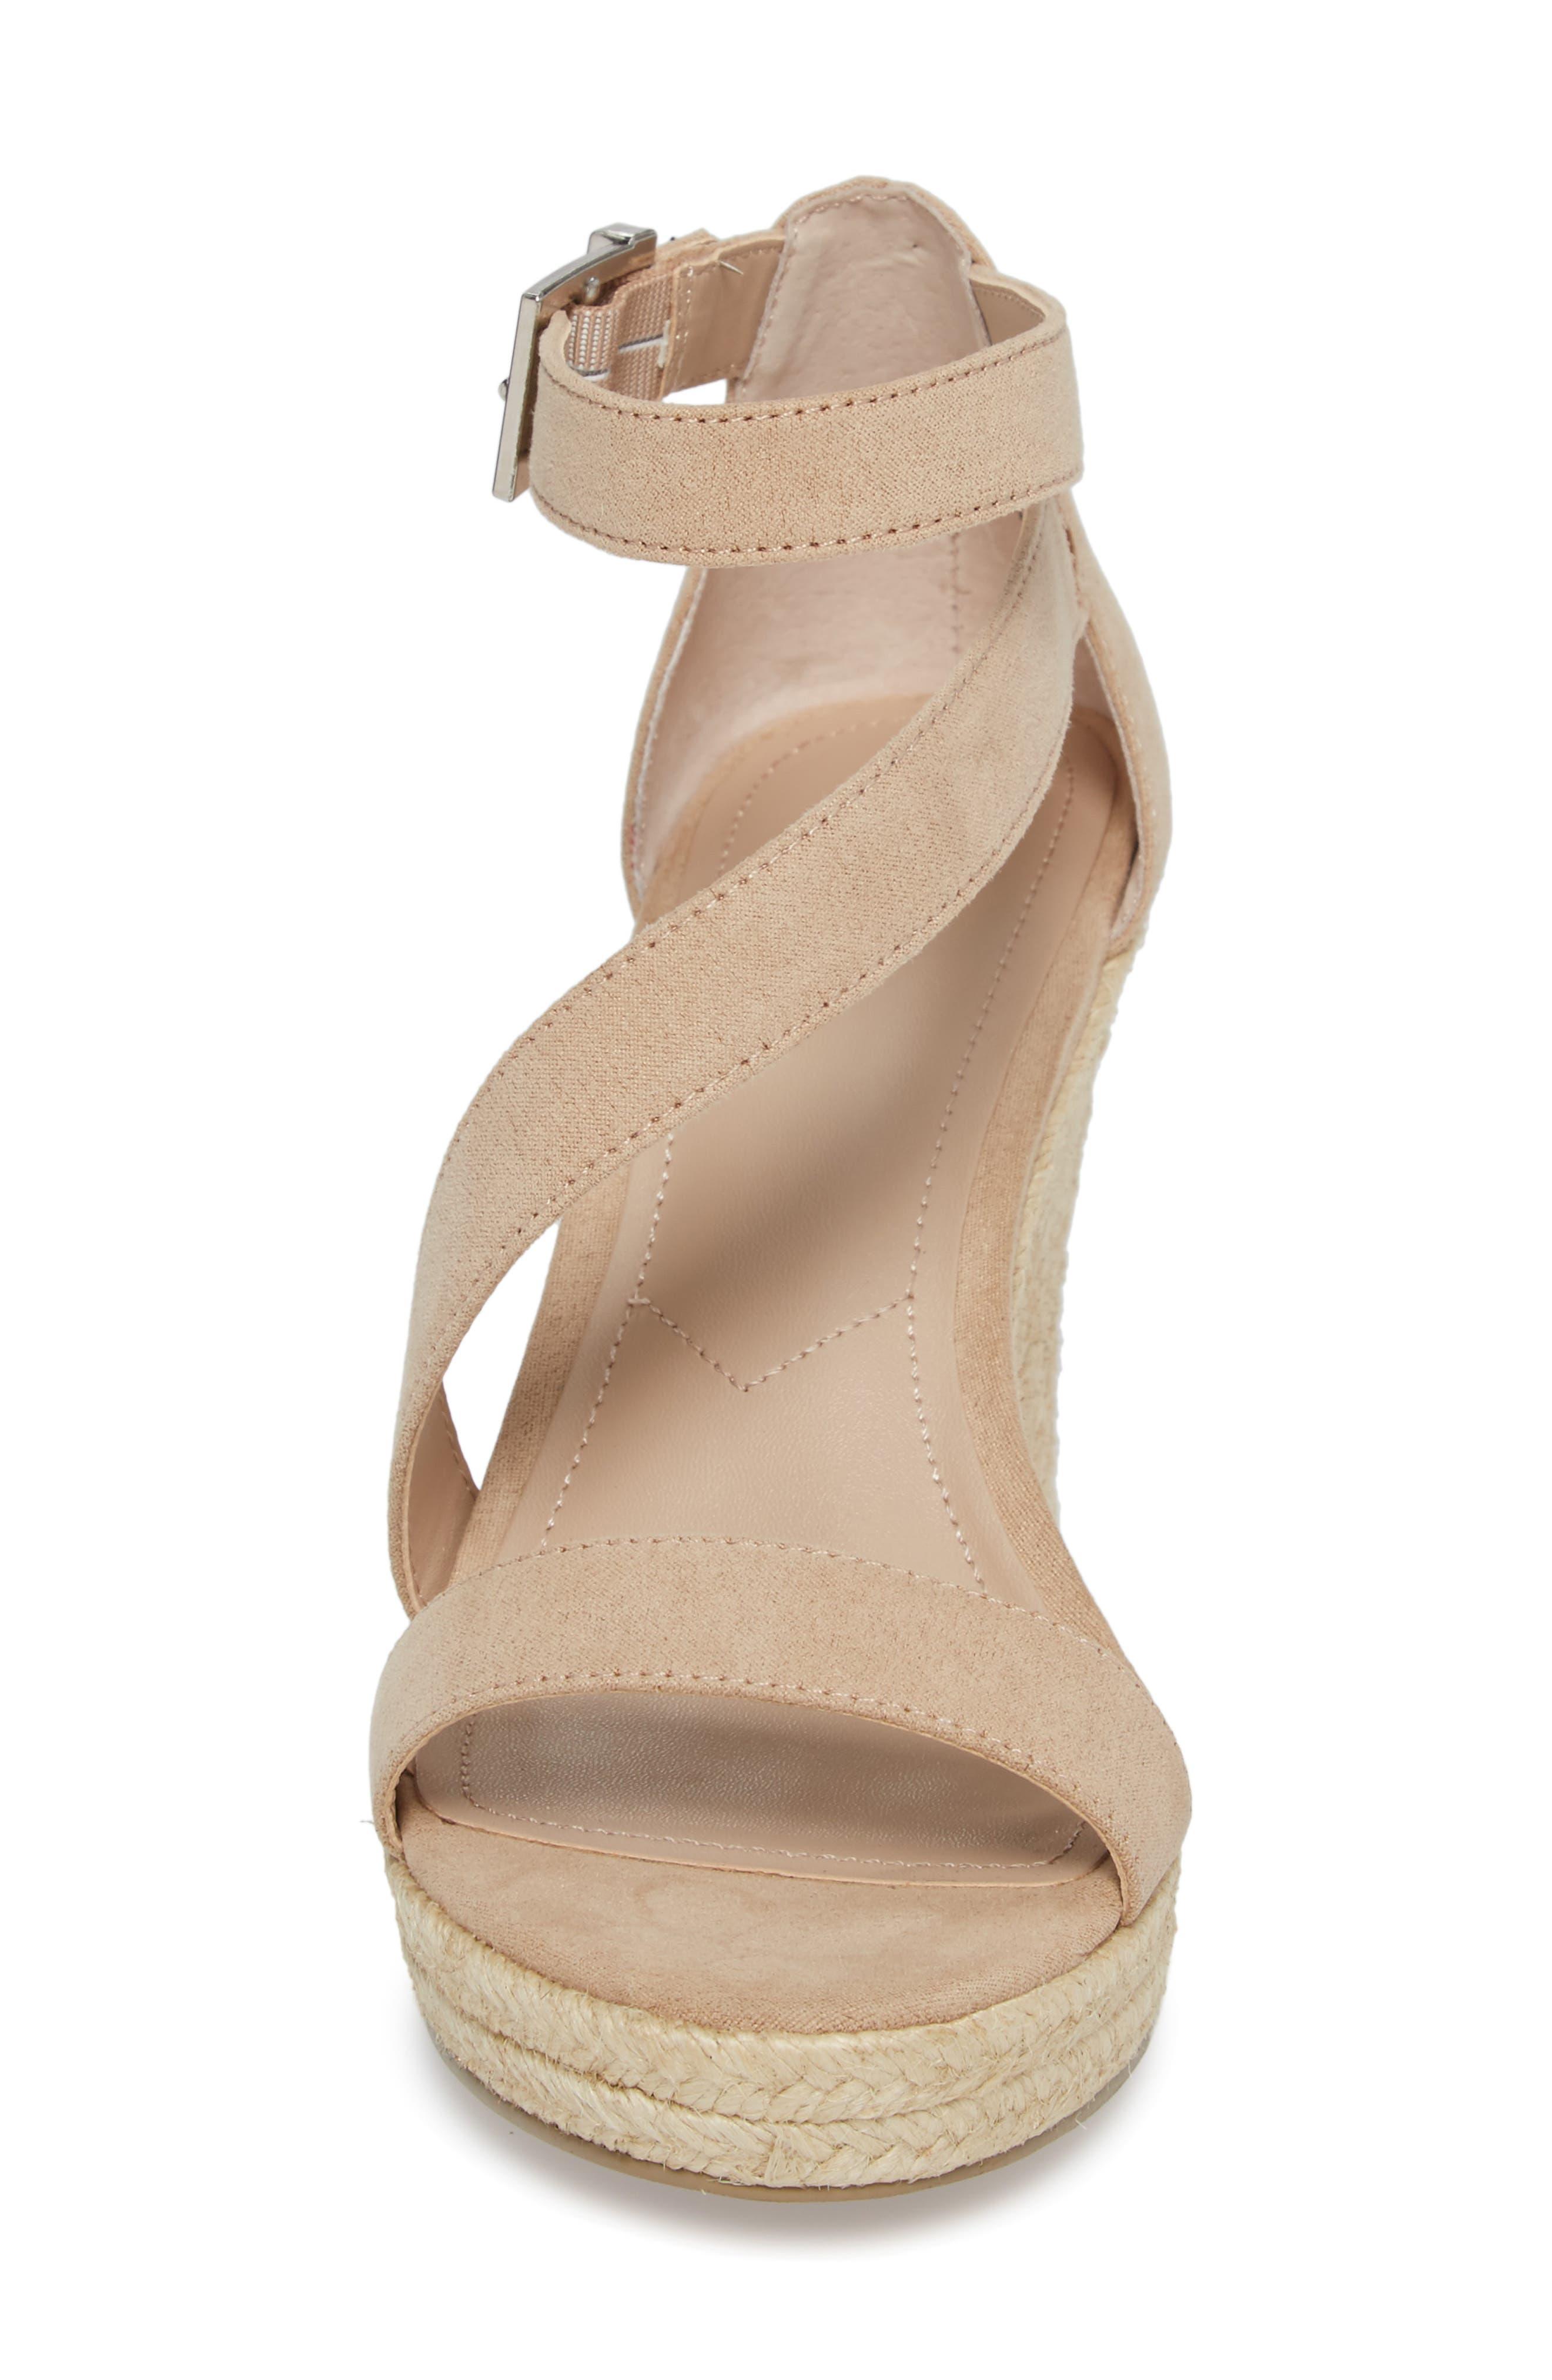 Lou Asymmetrical Wedge Sandal,                             Alternate thumbnail 4, color,                             Nude Suede